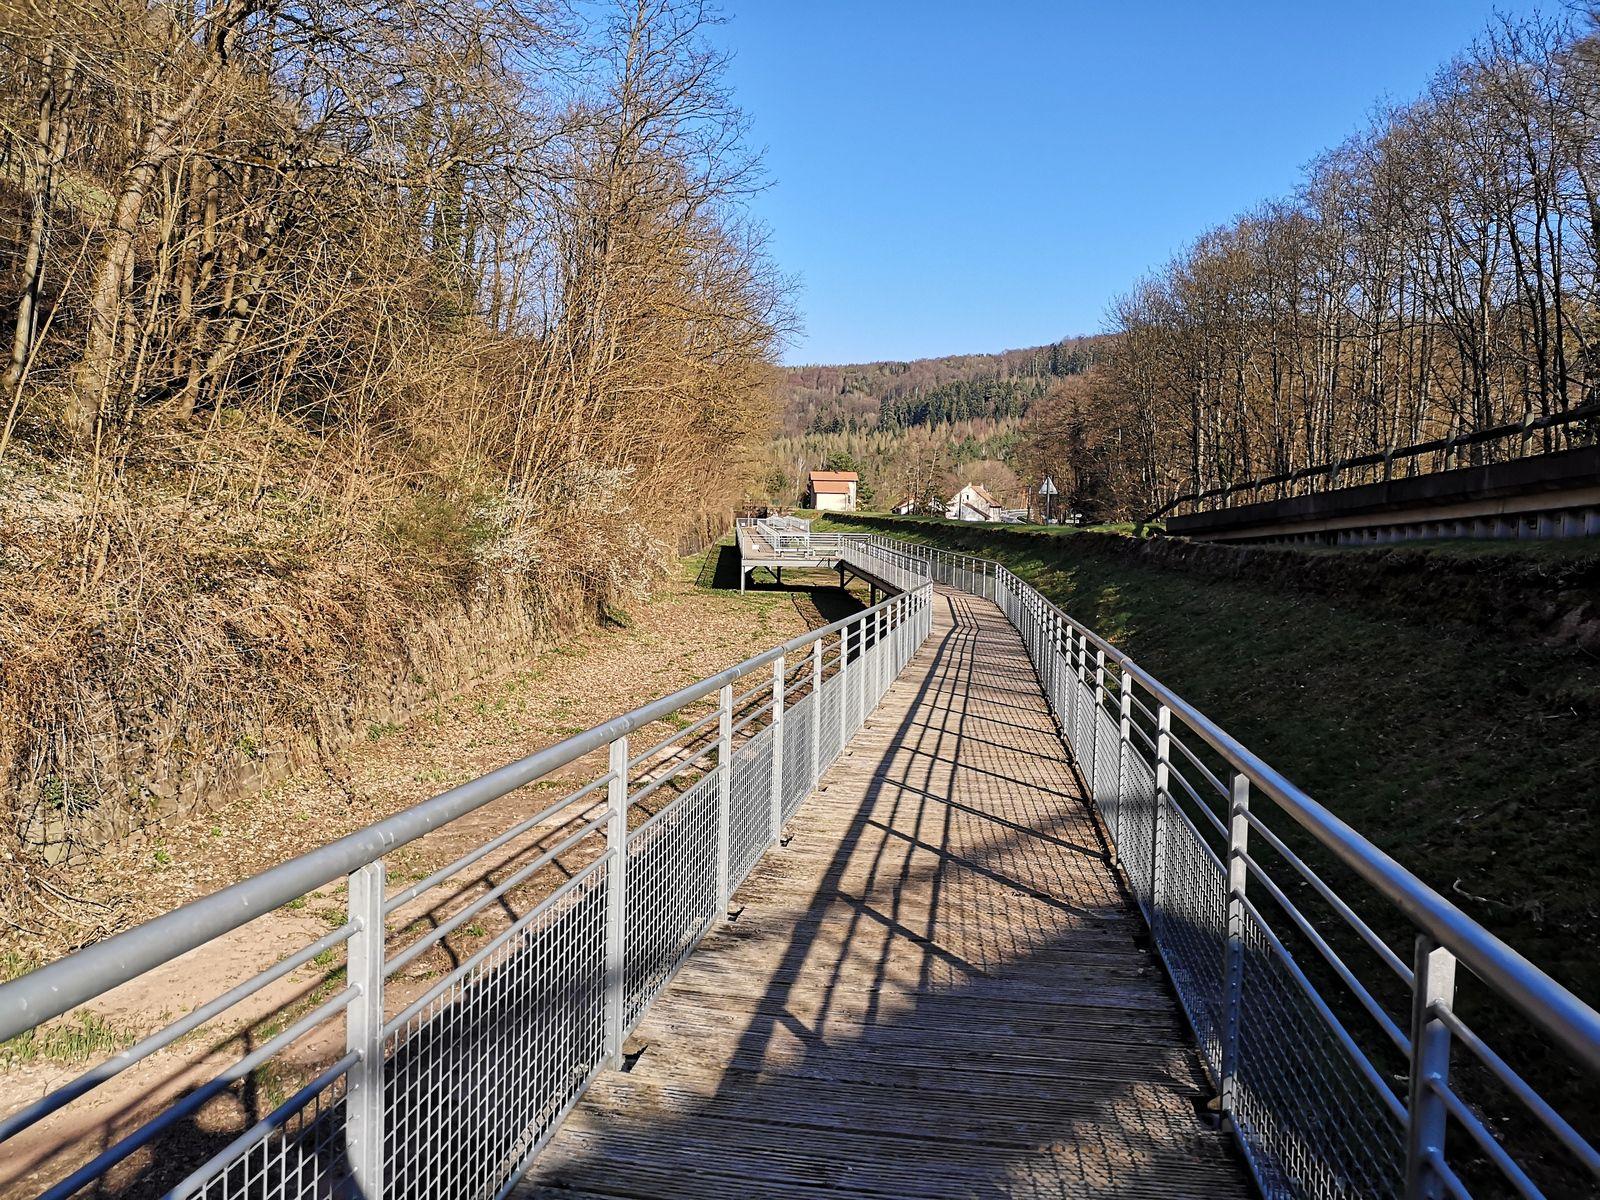 Le Sentier des Roches mosellan - 02/04/2021